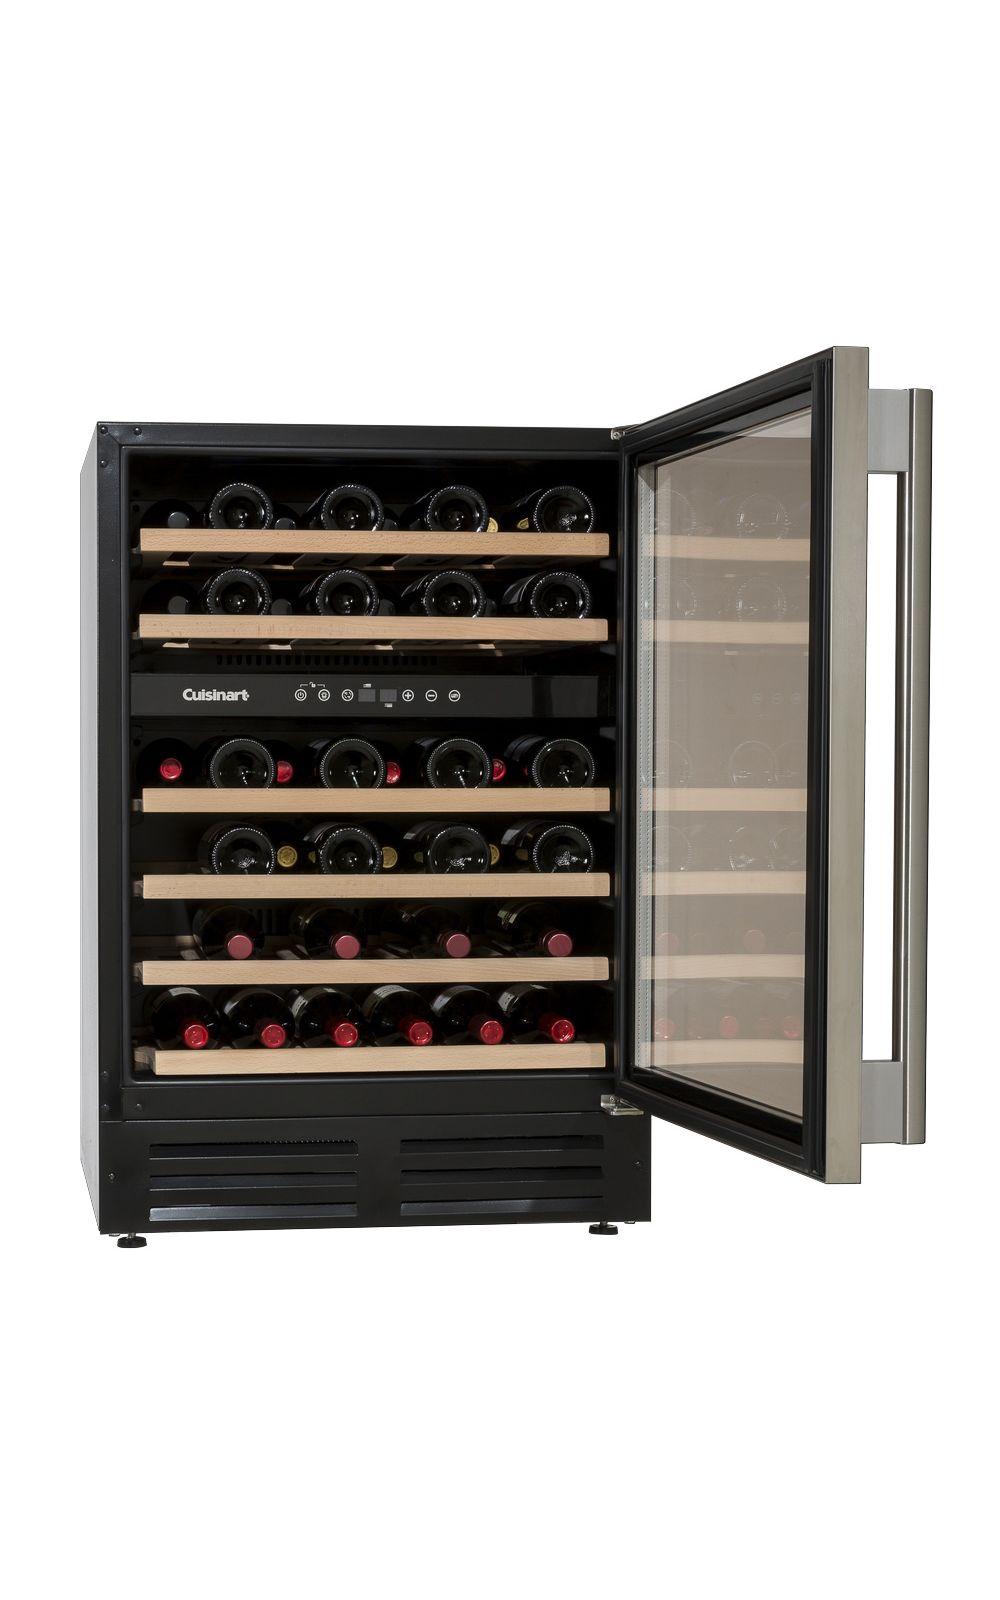 Foto 2 - Adega de Vinho 46 garrafas dual zone built in -220V prime cooking Cuisinart